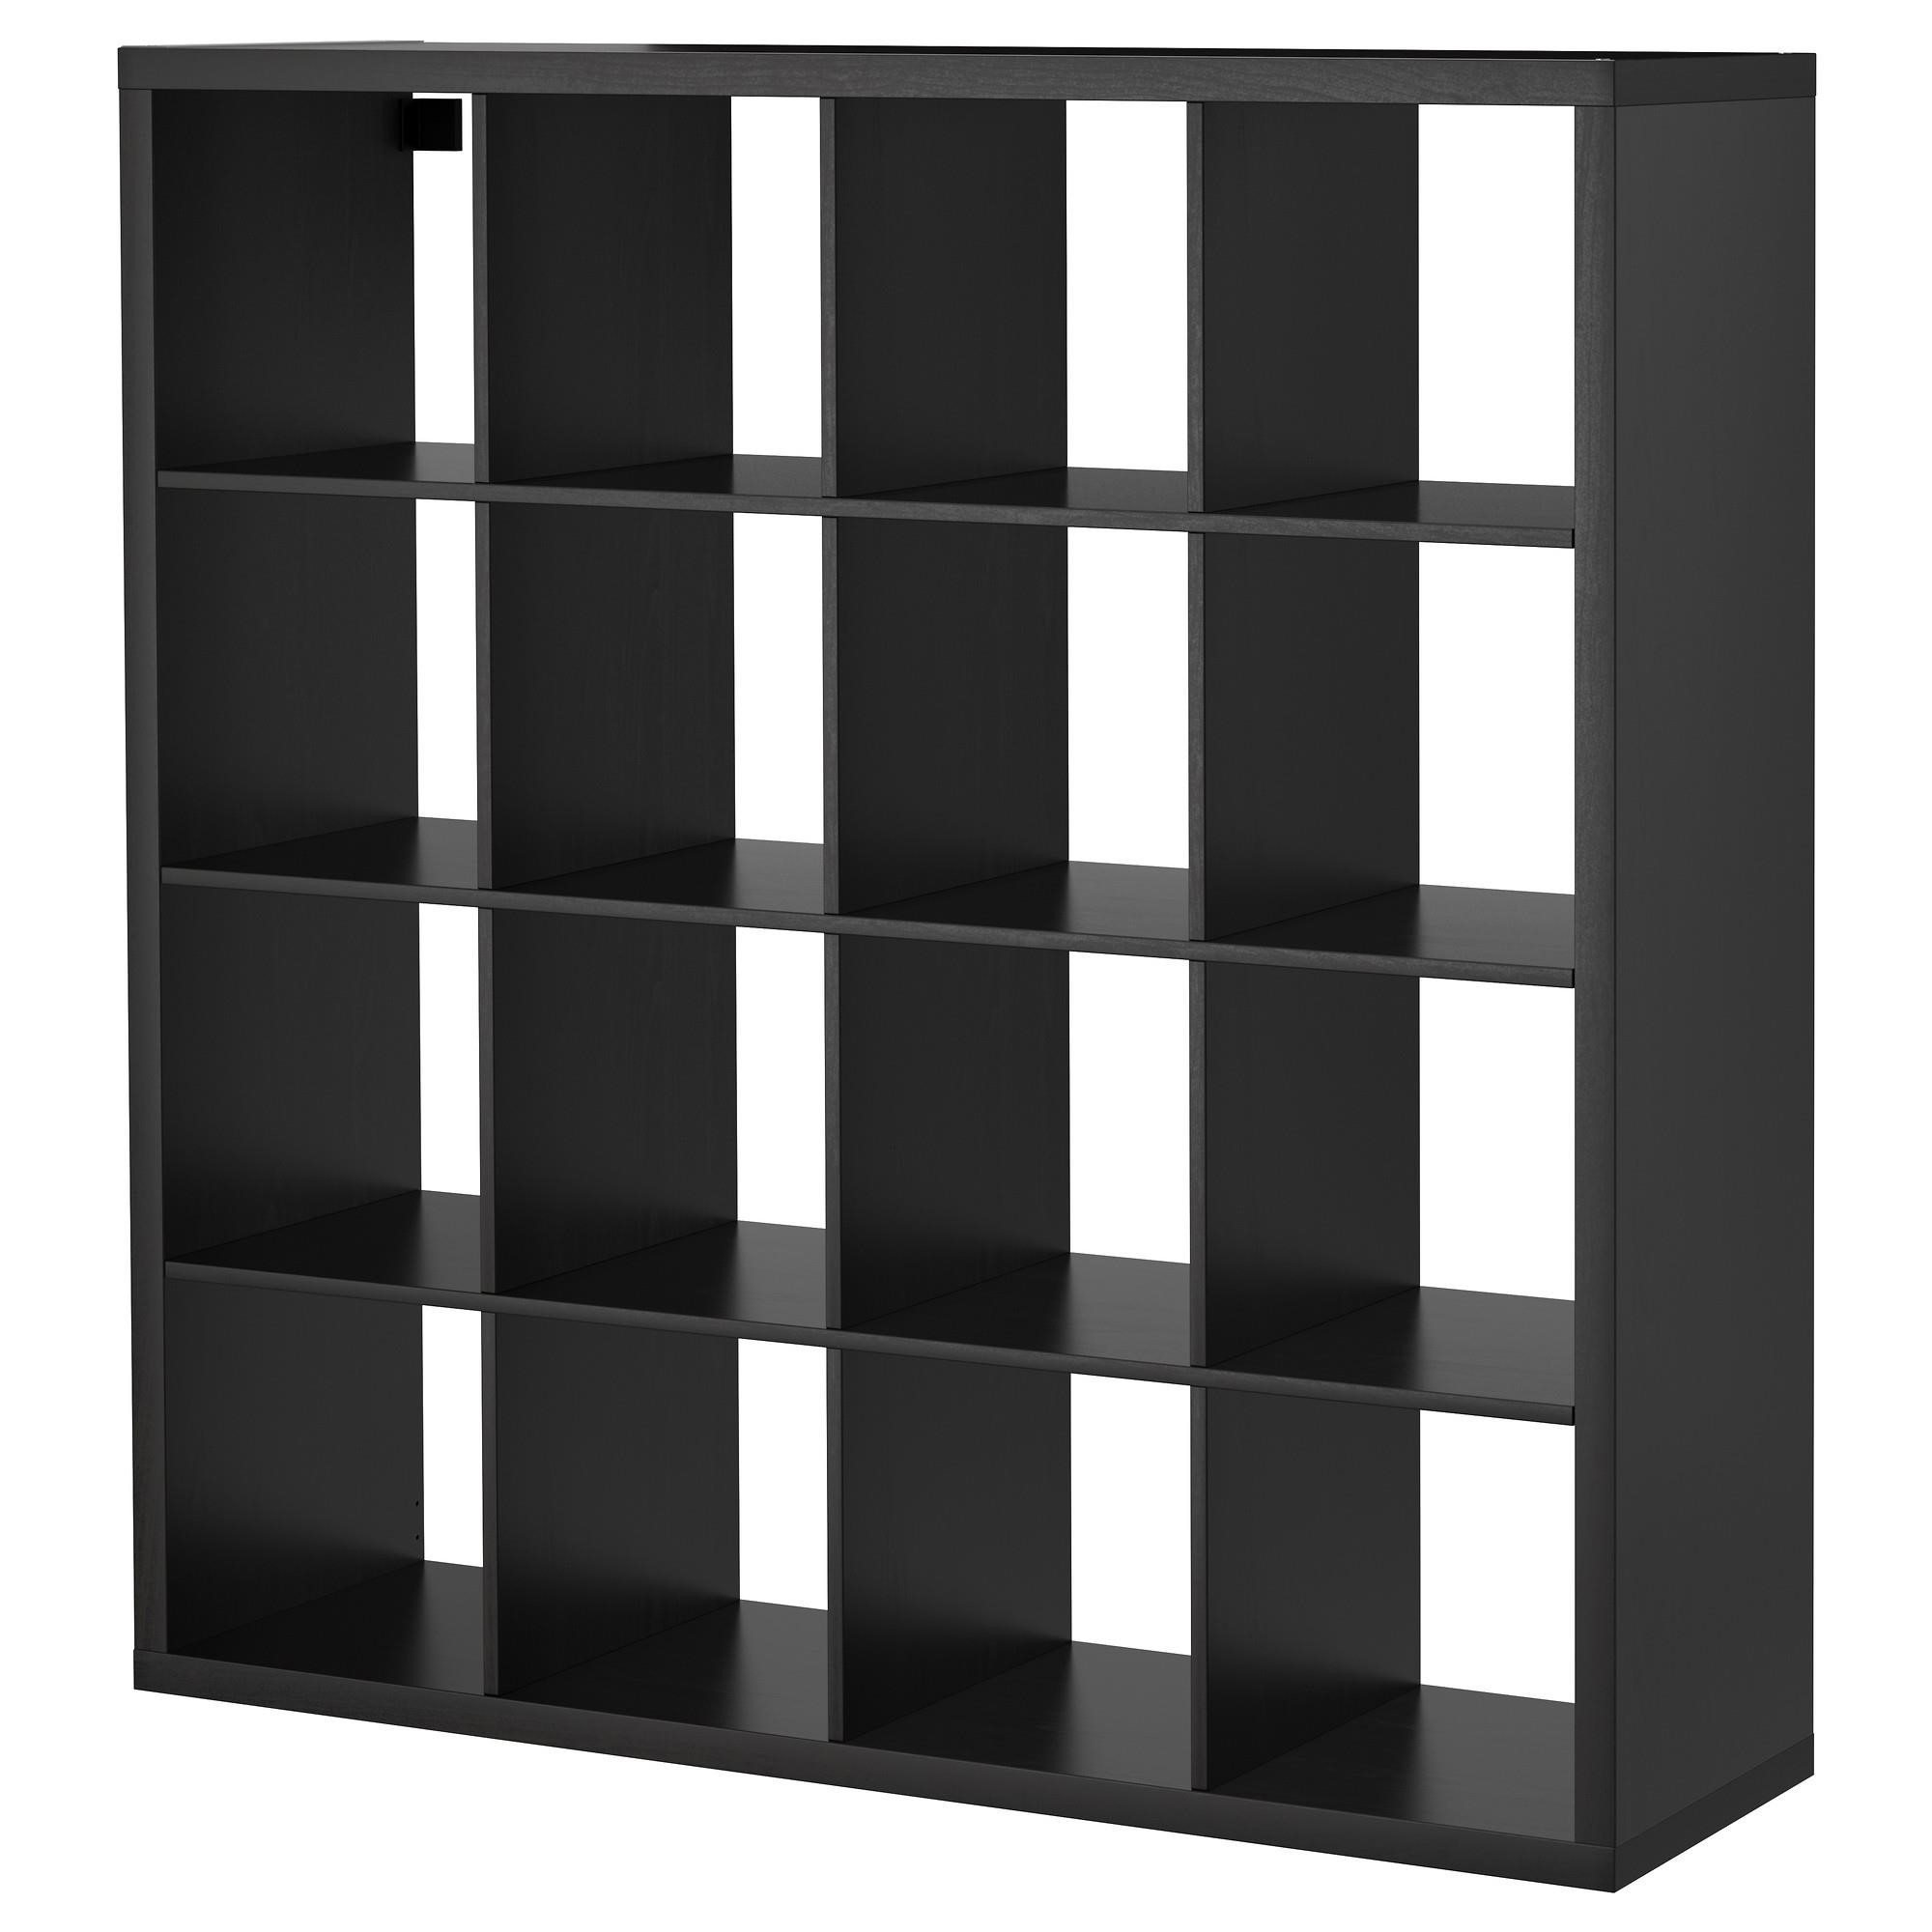 Fashionable Ikea Expedit Bookcases For Ikea Kallax Shelf Expedit Hack Whitekcaseexpeditkcase Instructions (View 3 of 15)